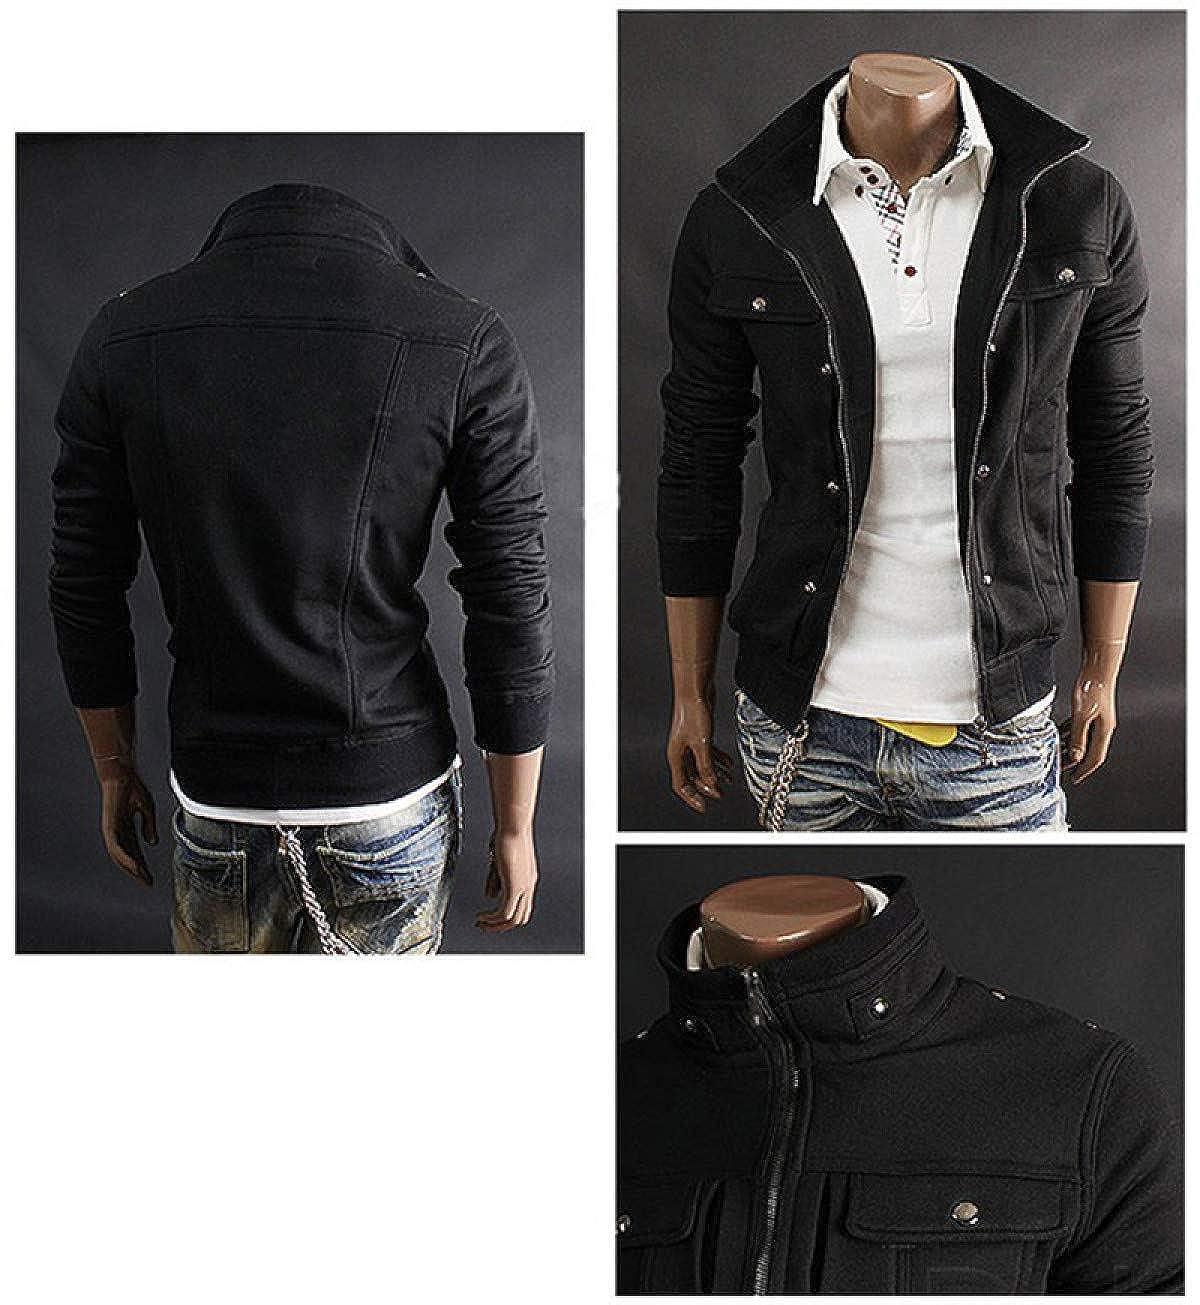 Amazon.com: Top Slim Mens Sweatshirt Casual Men Tracksuits Popular for Male Hoodie: Clothing